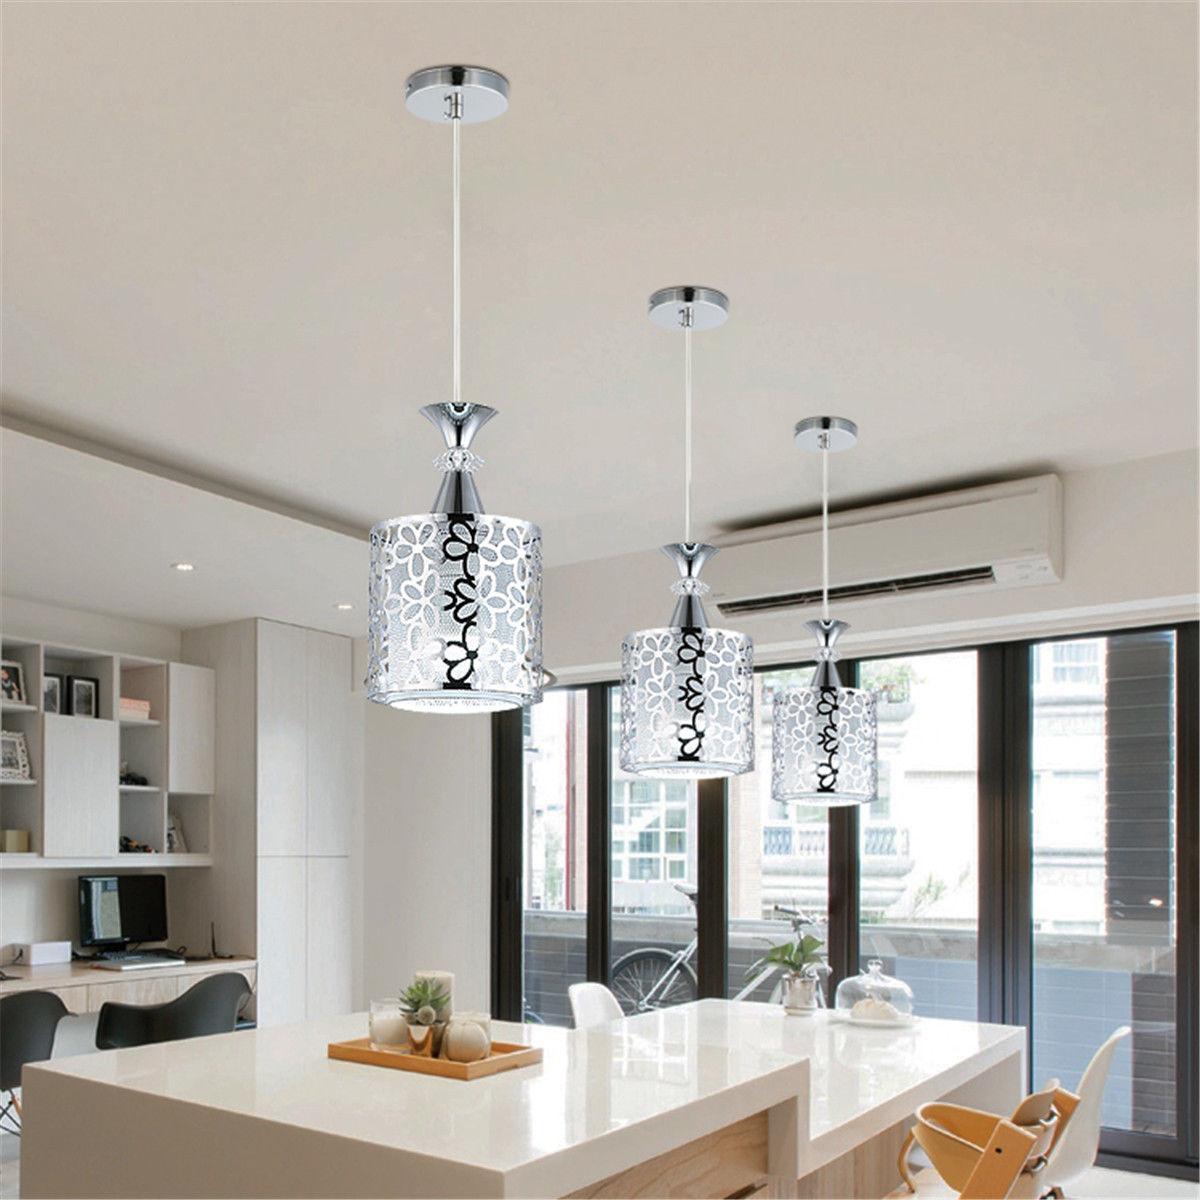 Ceiling Light Modern Crystal Iron Pendant Lamp Dining Room